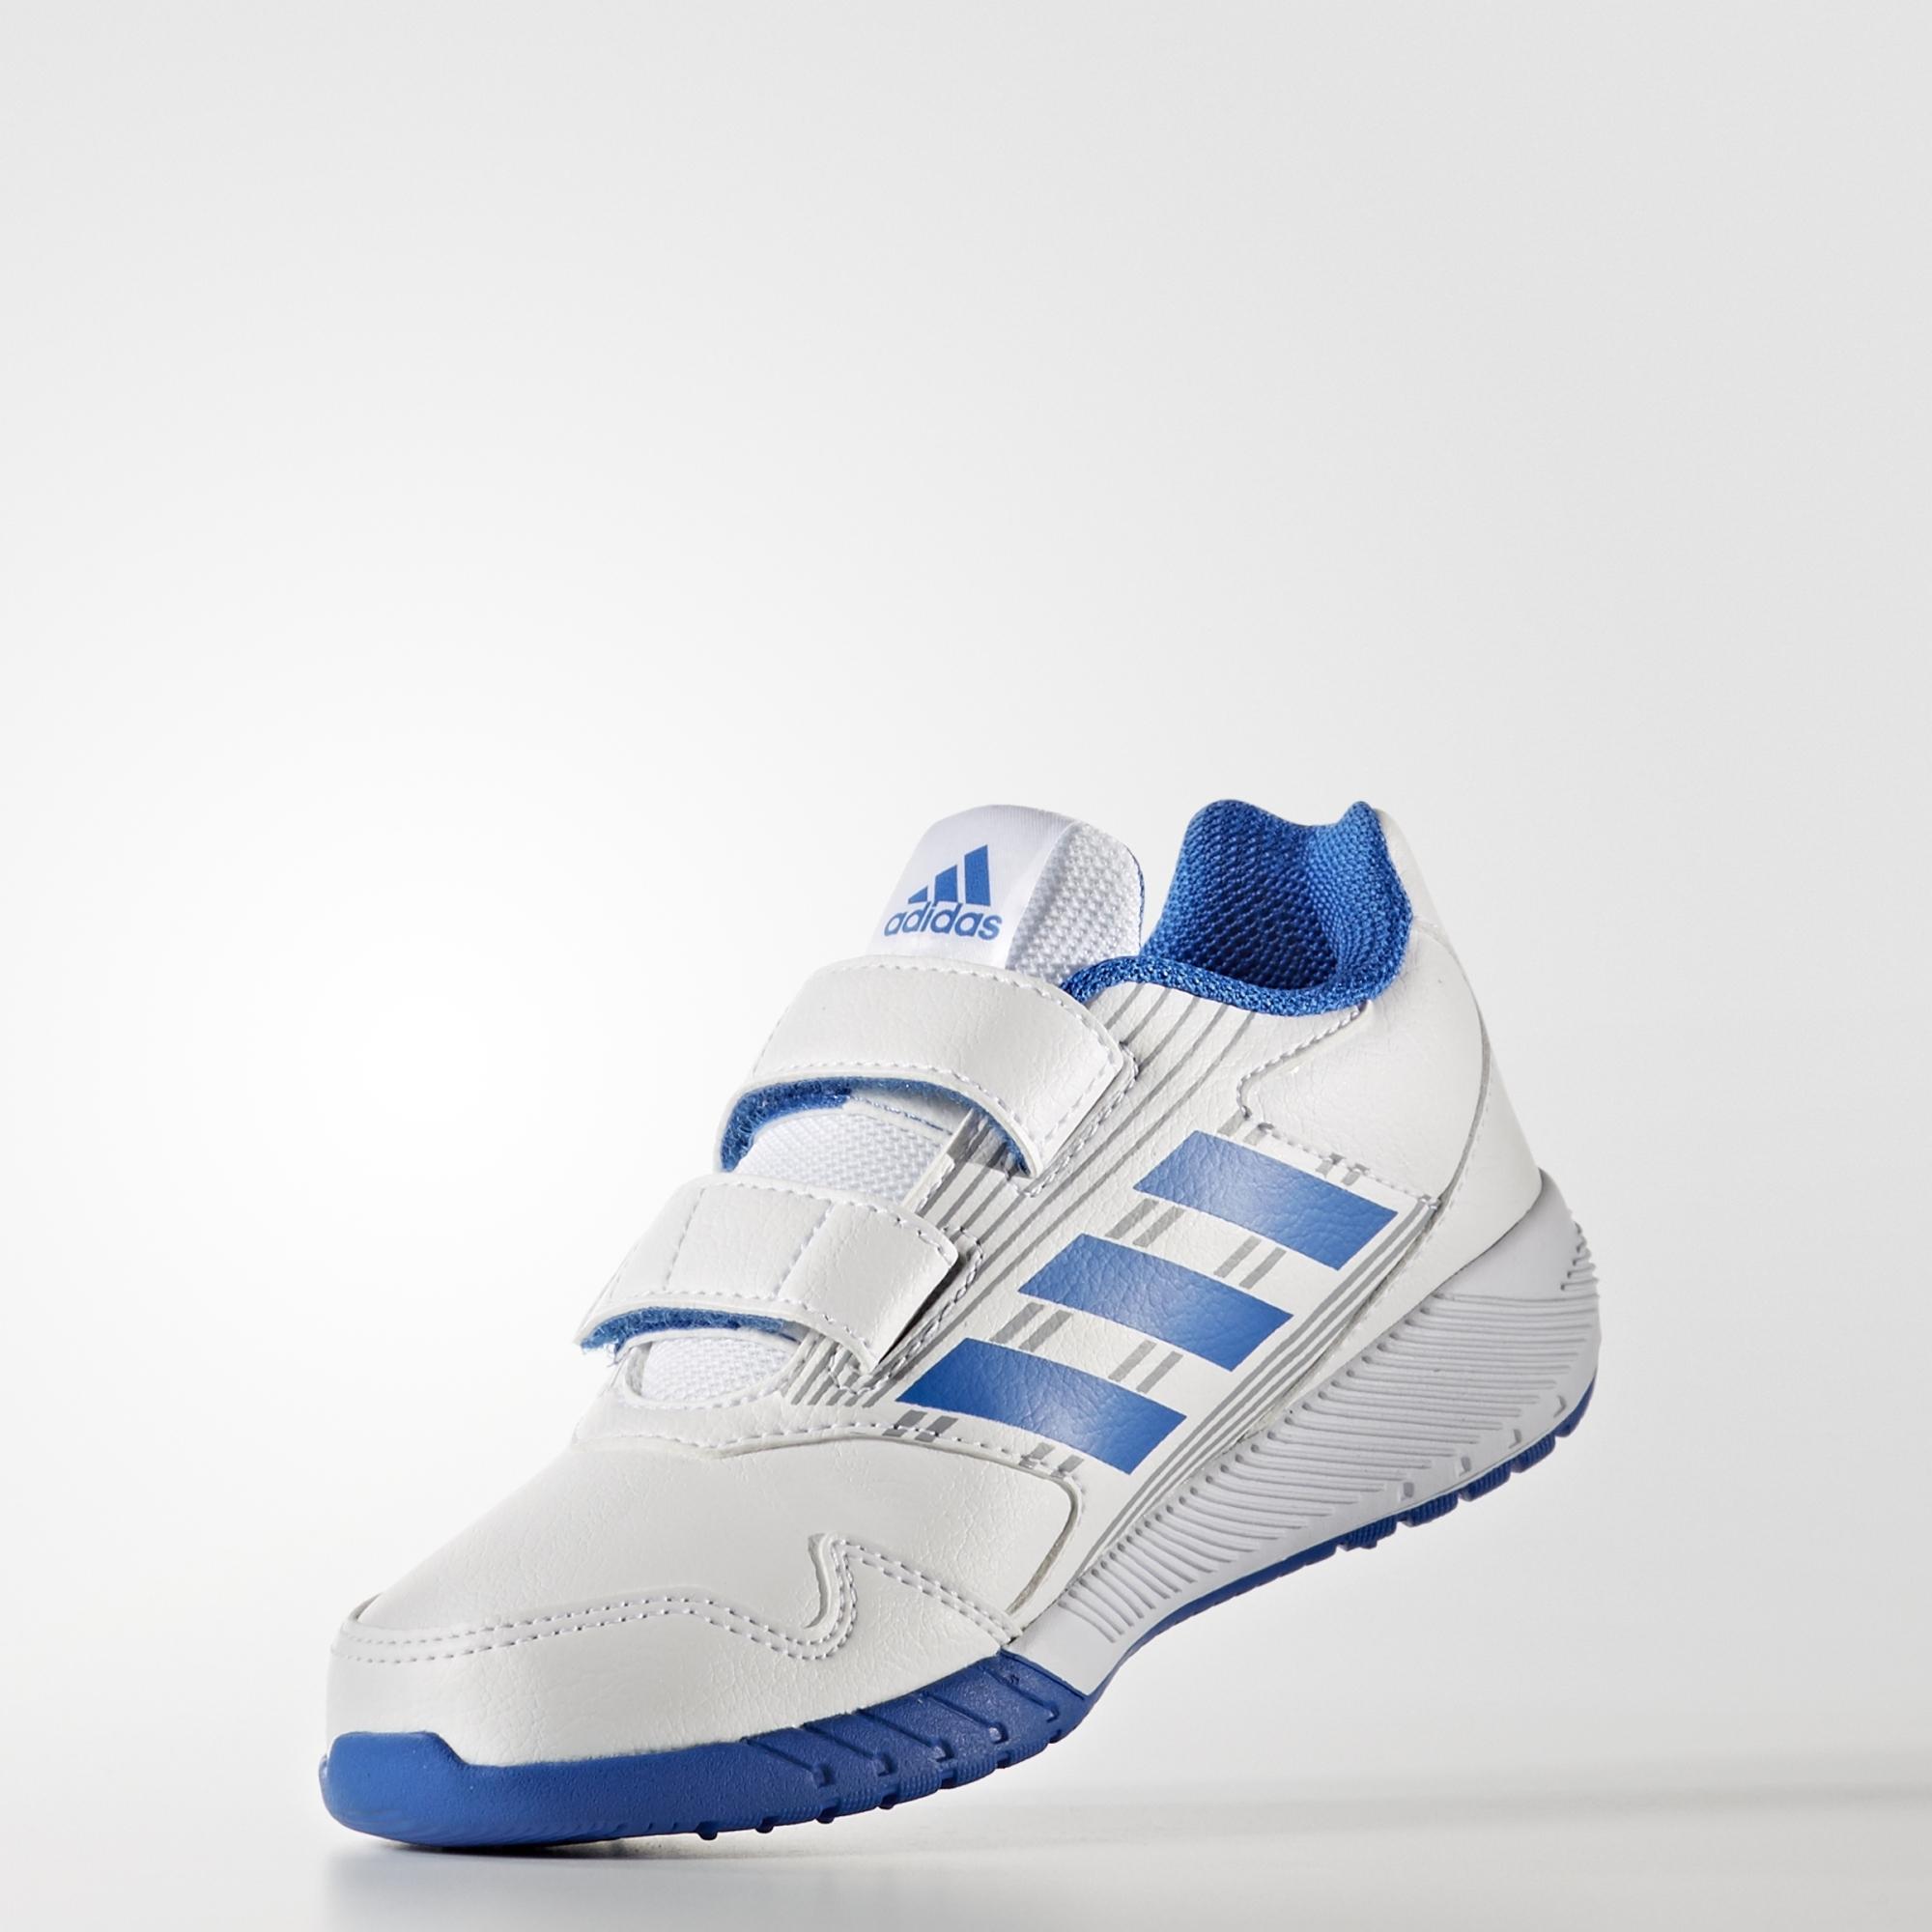 Chaussures junior adidas AltaRun Chaussures adidas